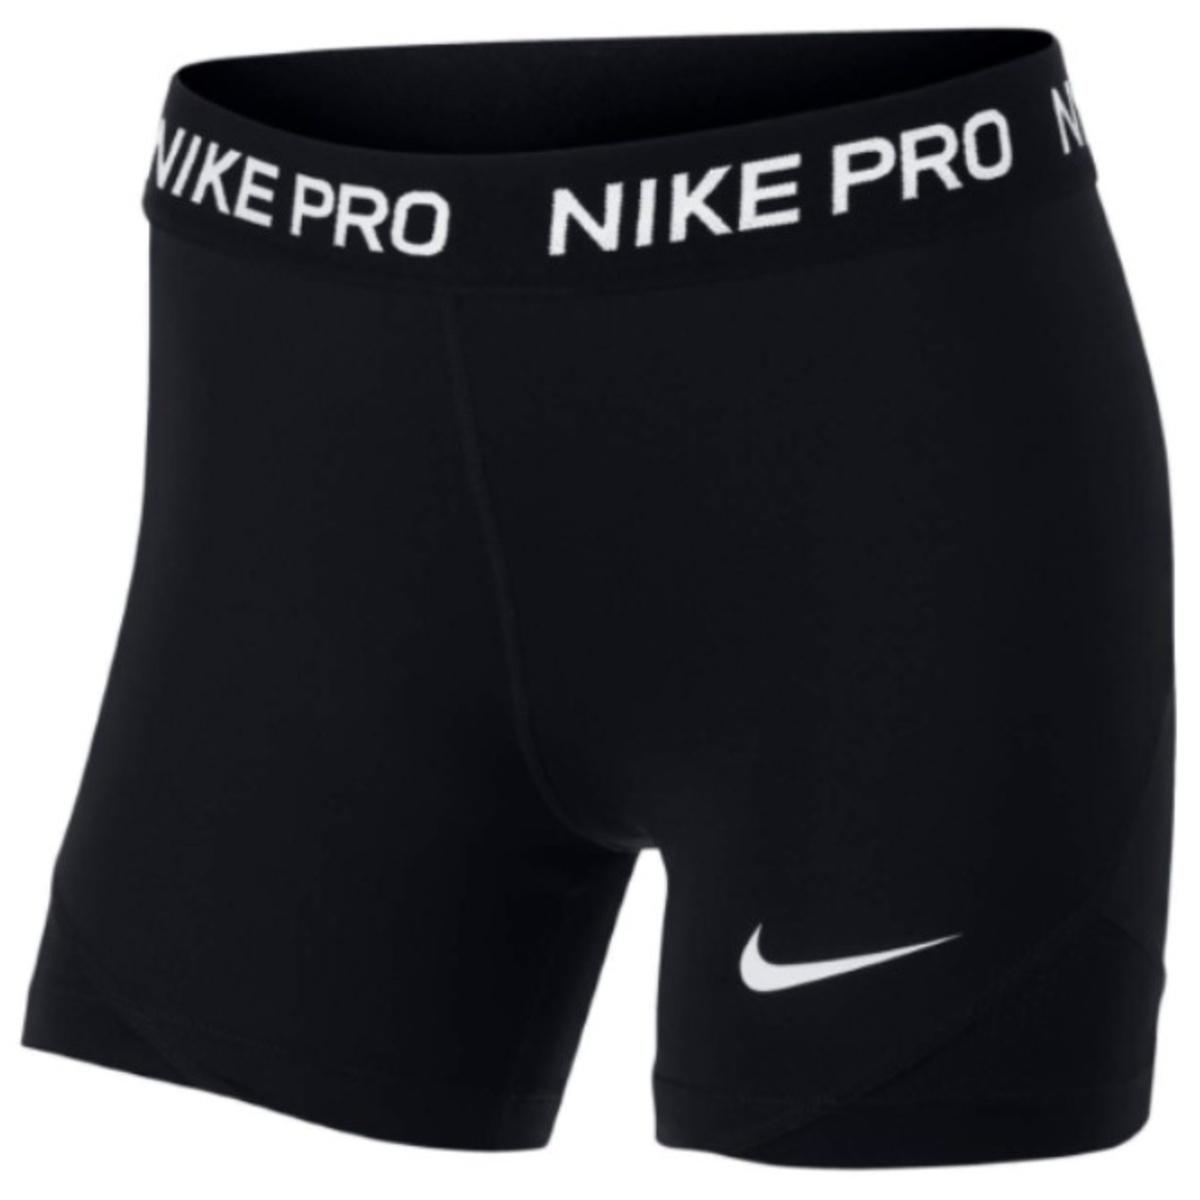 Nike, pro, tights, sort, kort